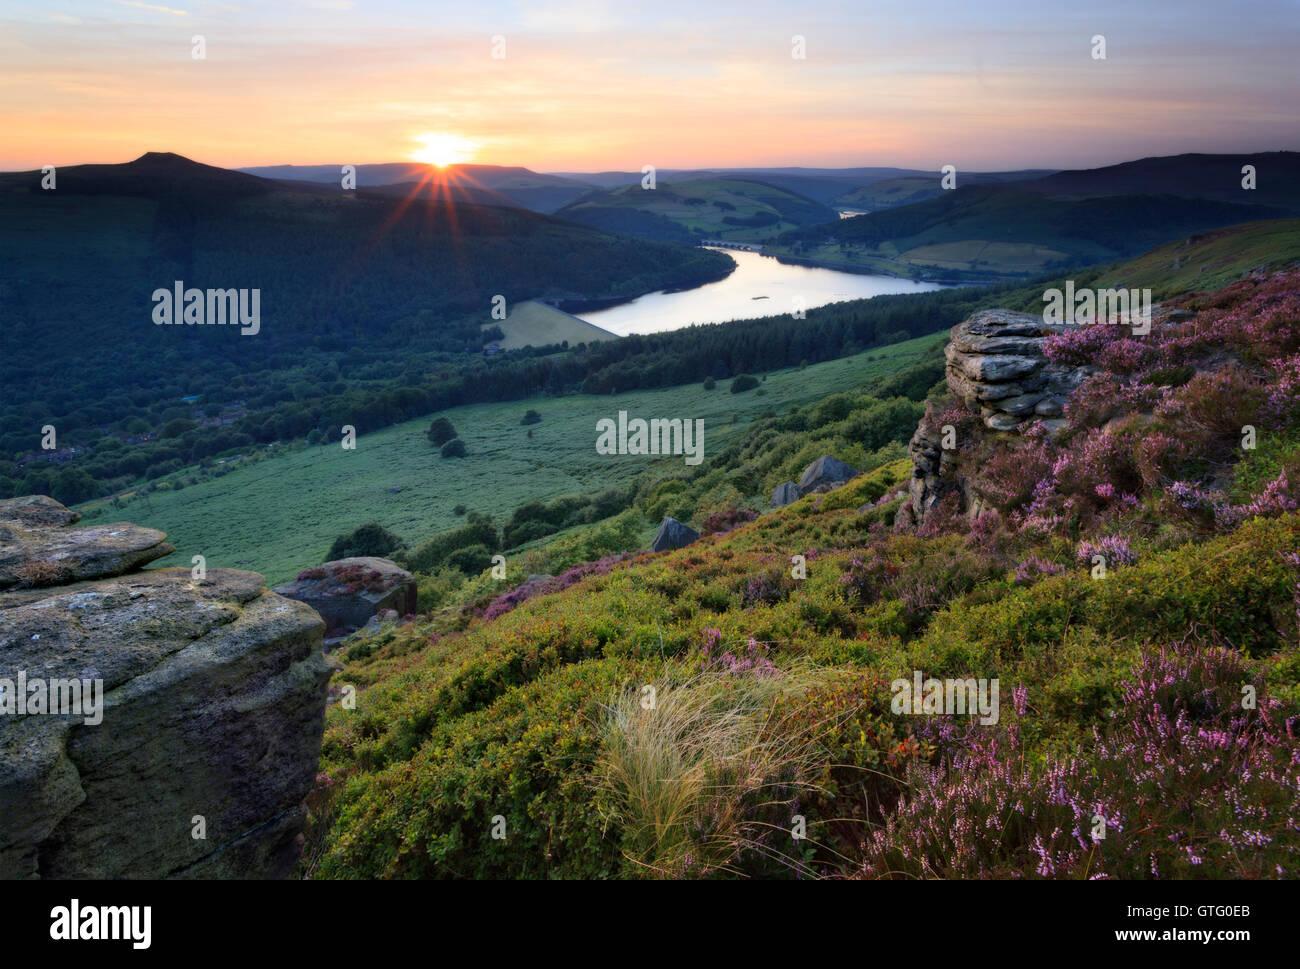 Bamford Edge at sunset - Stock Image